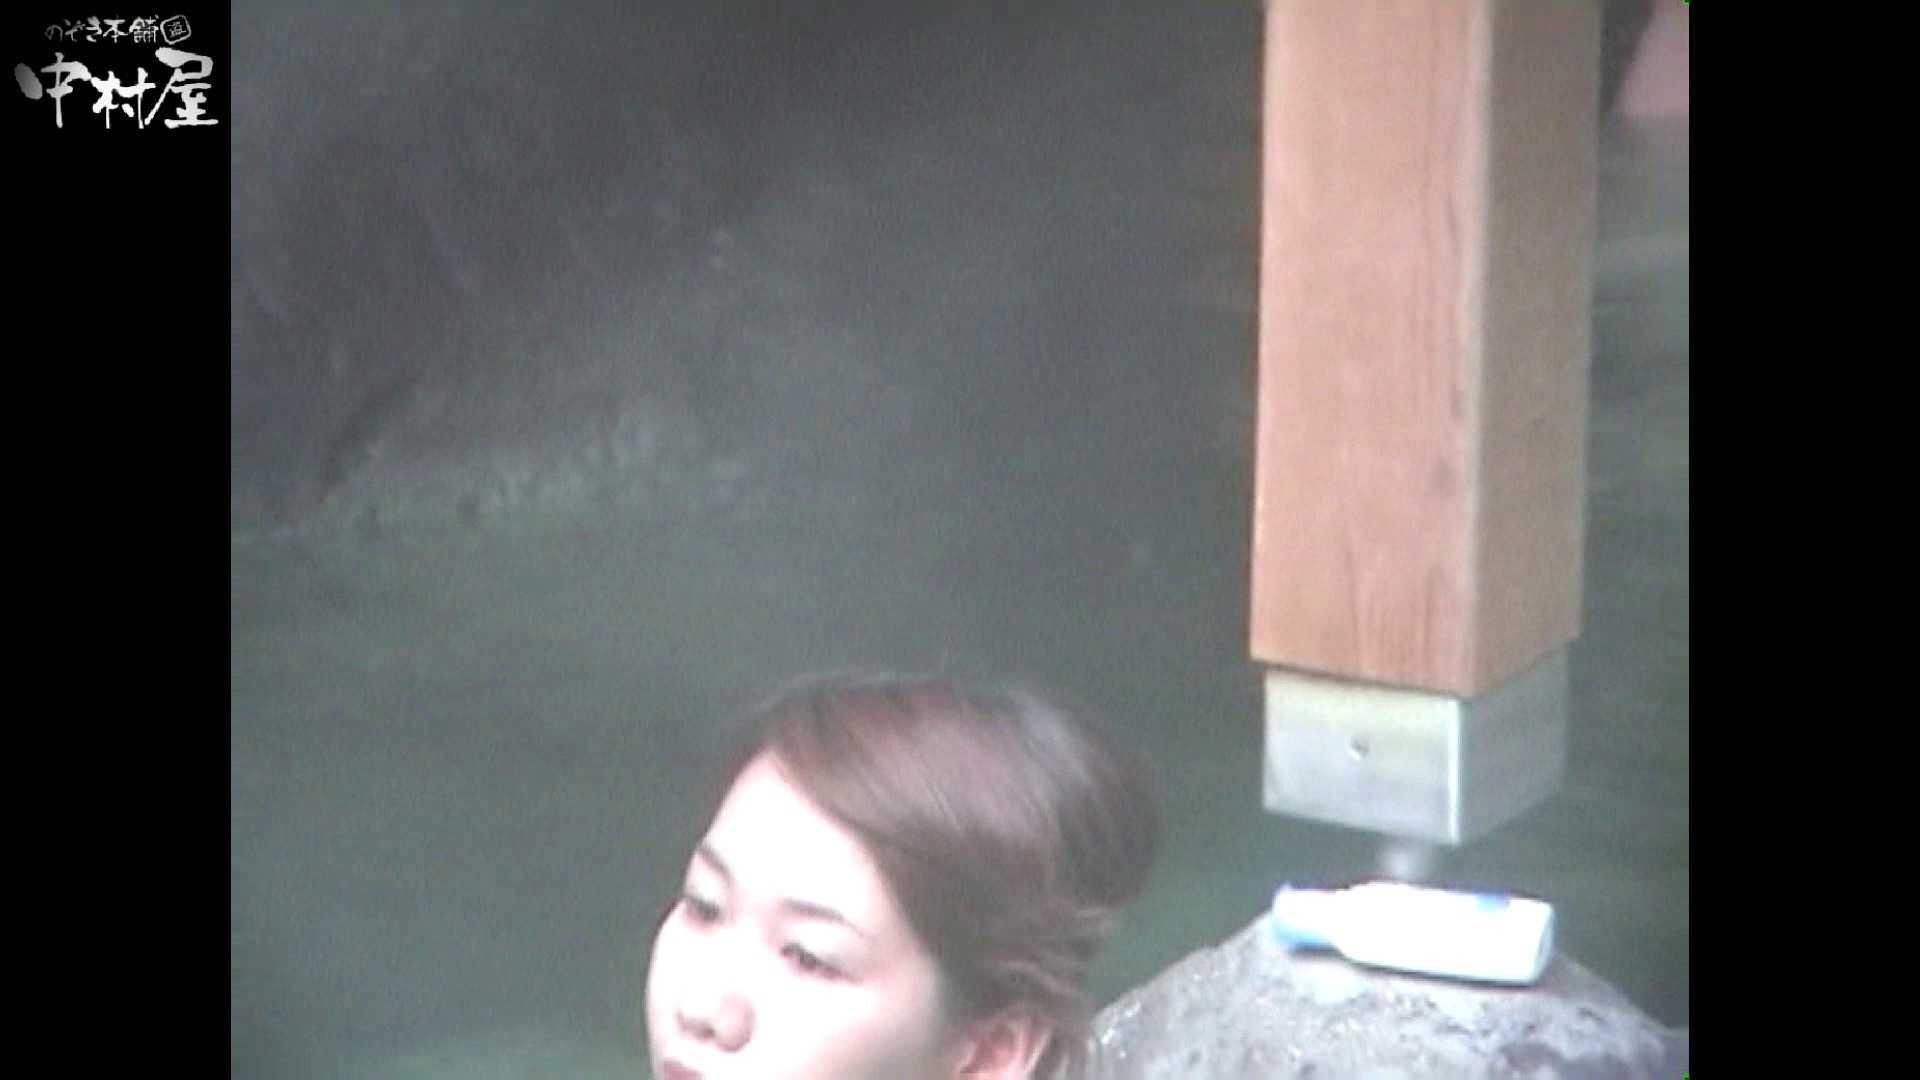 Aquaな露天風呂Vol.951 盗撮映像  93Pix 52